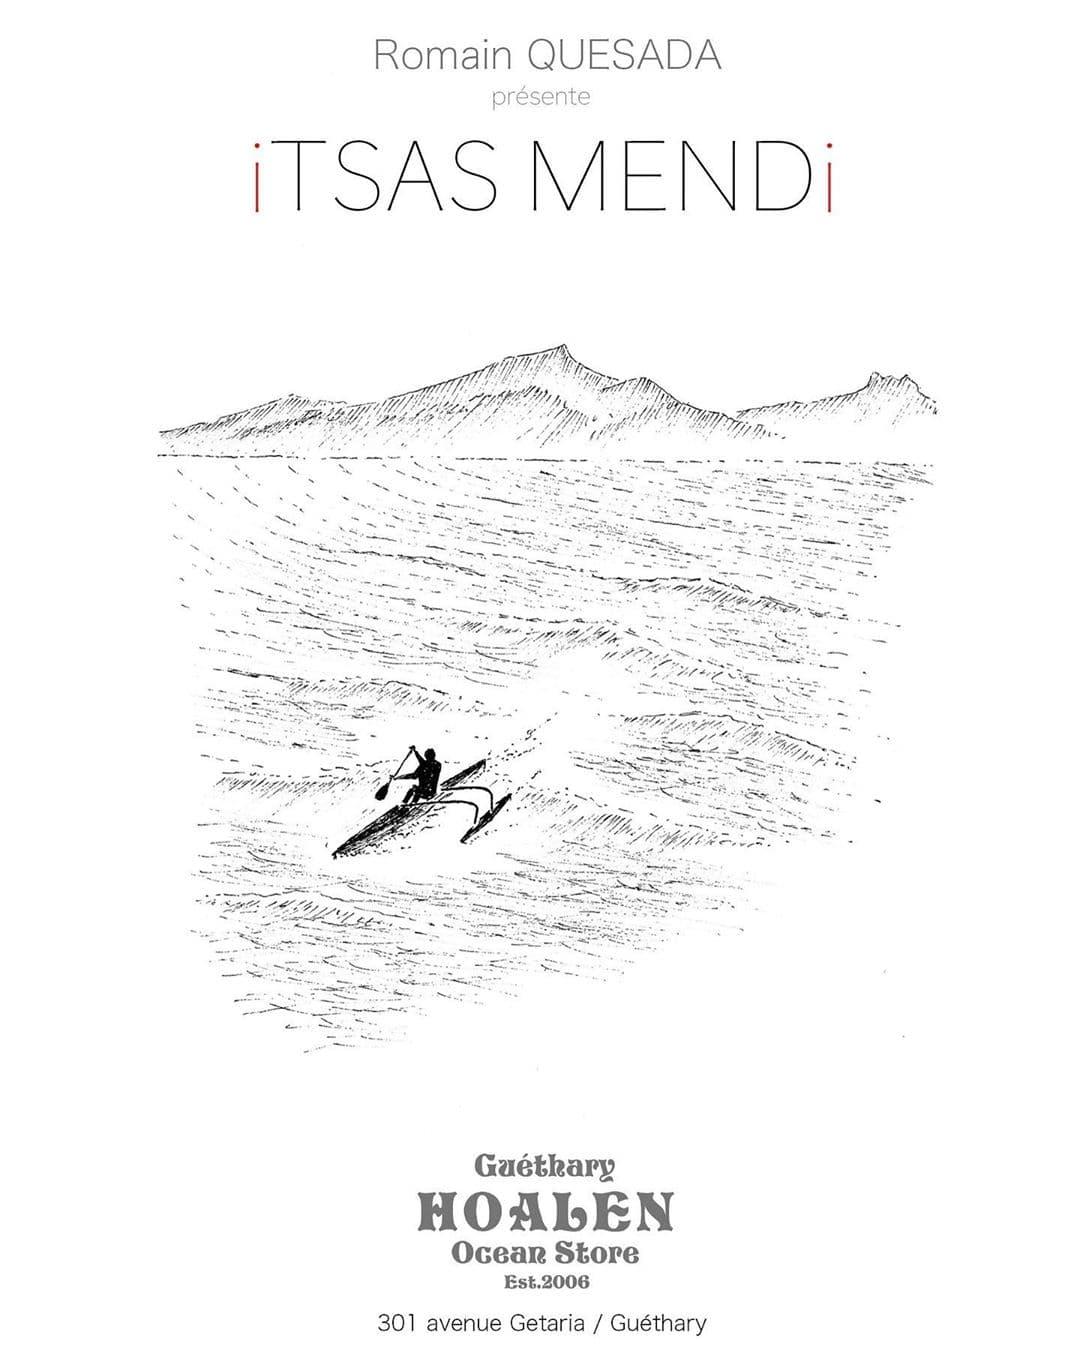 Itsas Mendi Romain Quesada affiche exposition